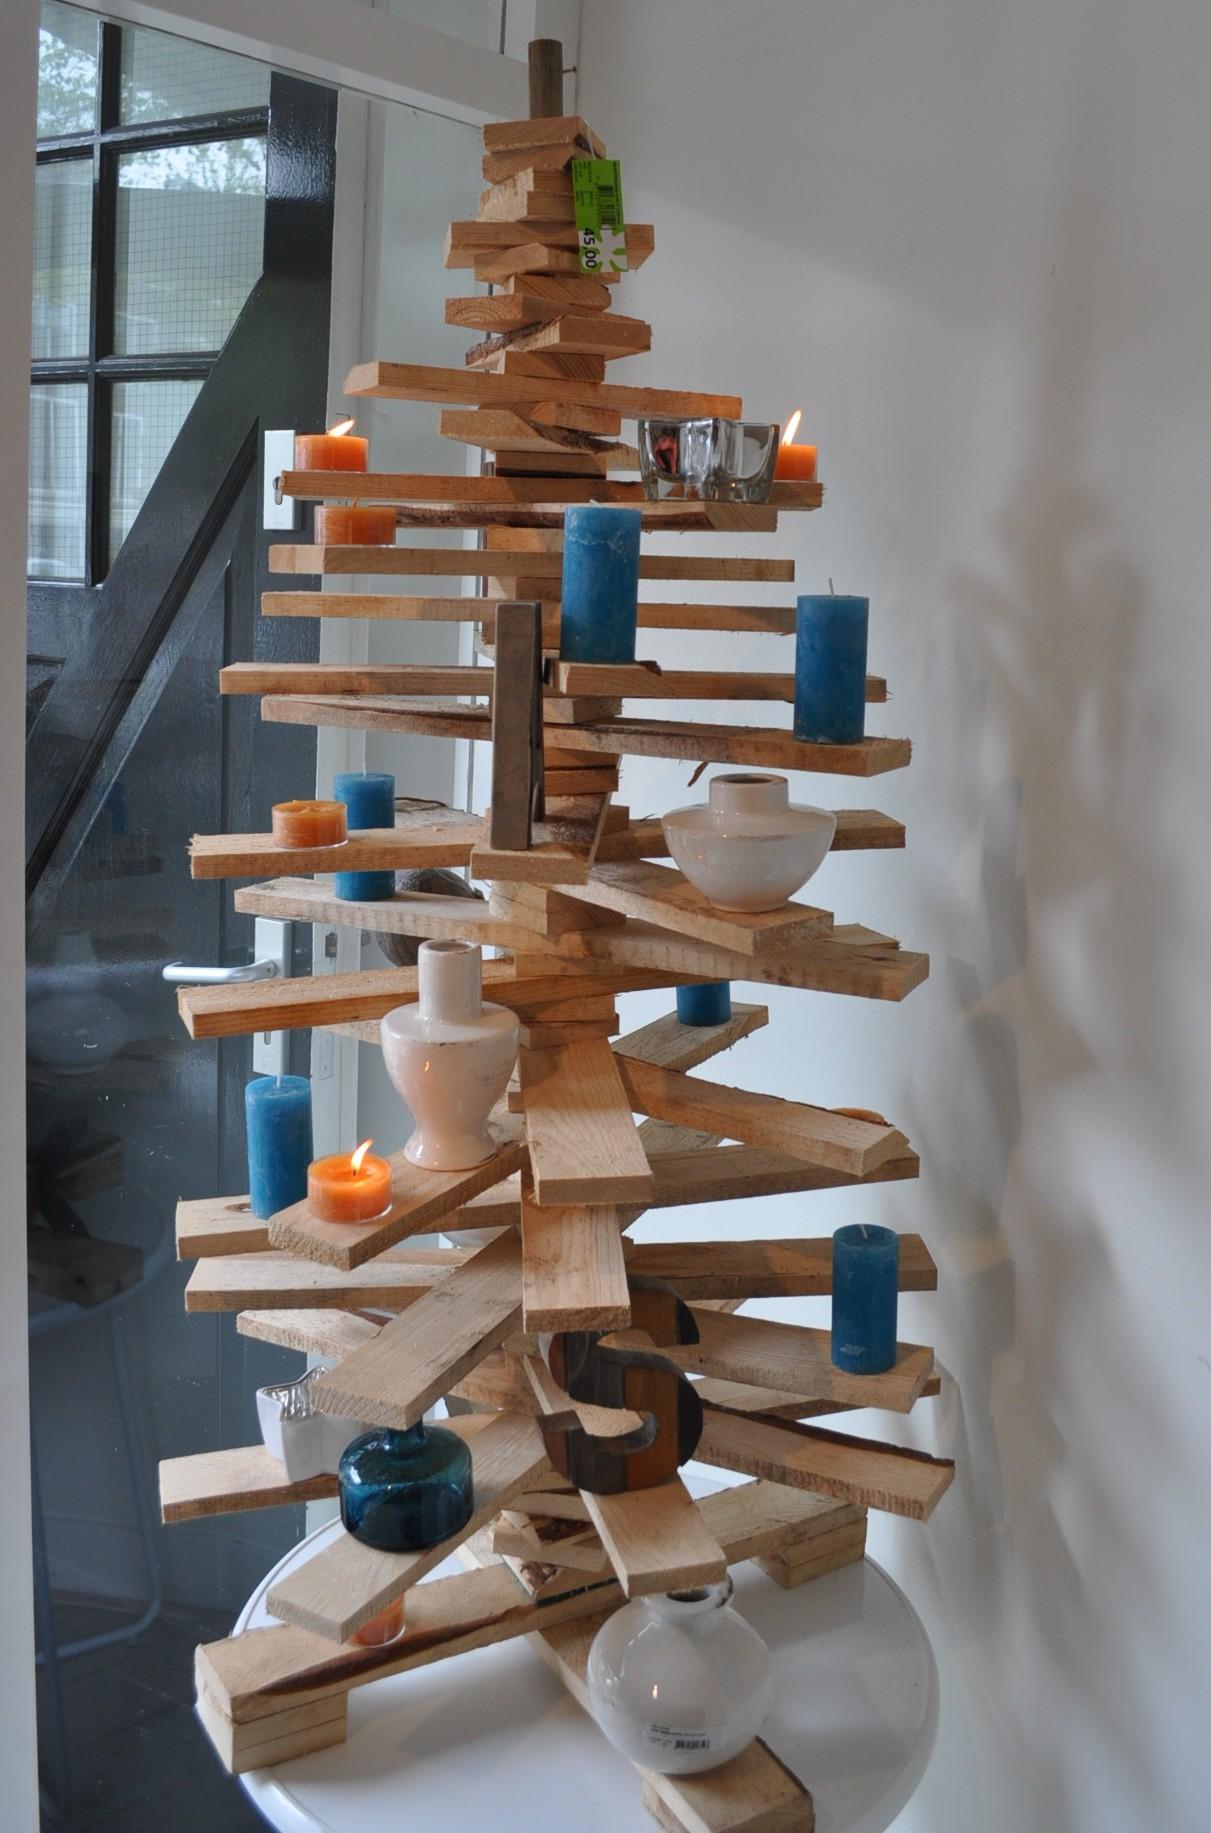 Kersttrends 2013 8 blauw wit hout for Houten tuinkast intratuin